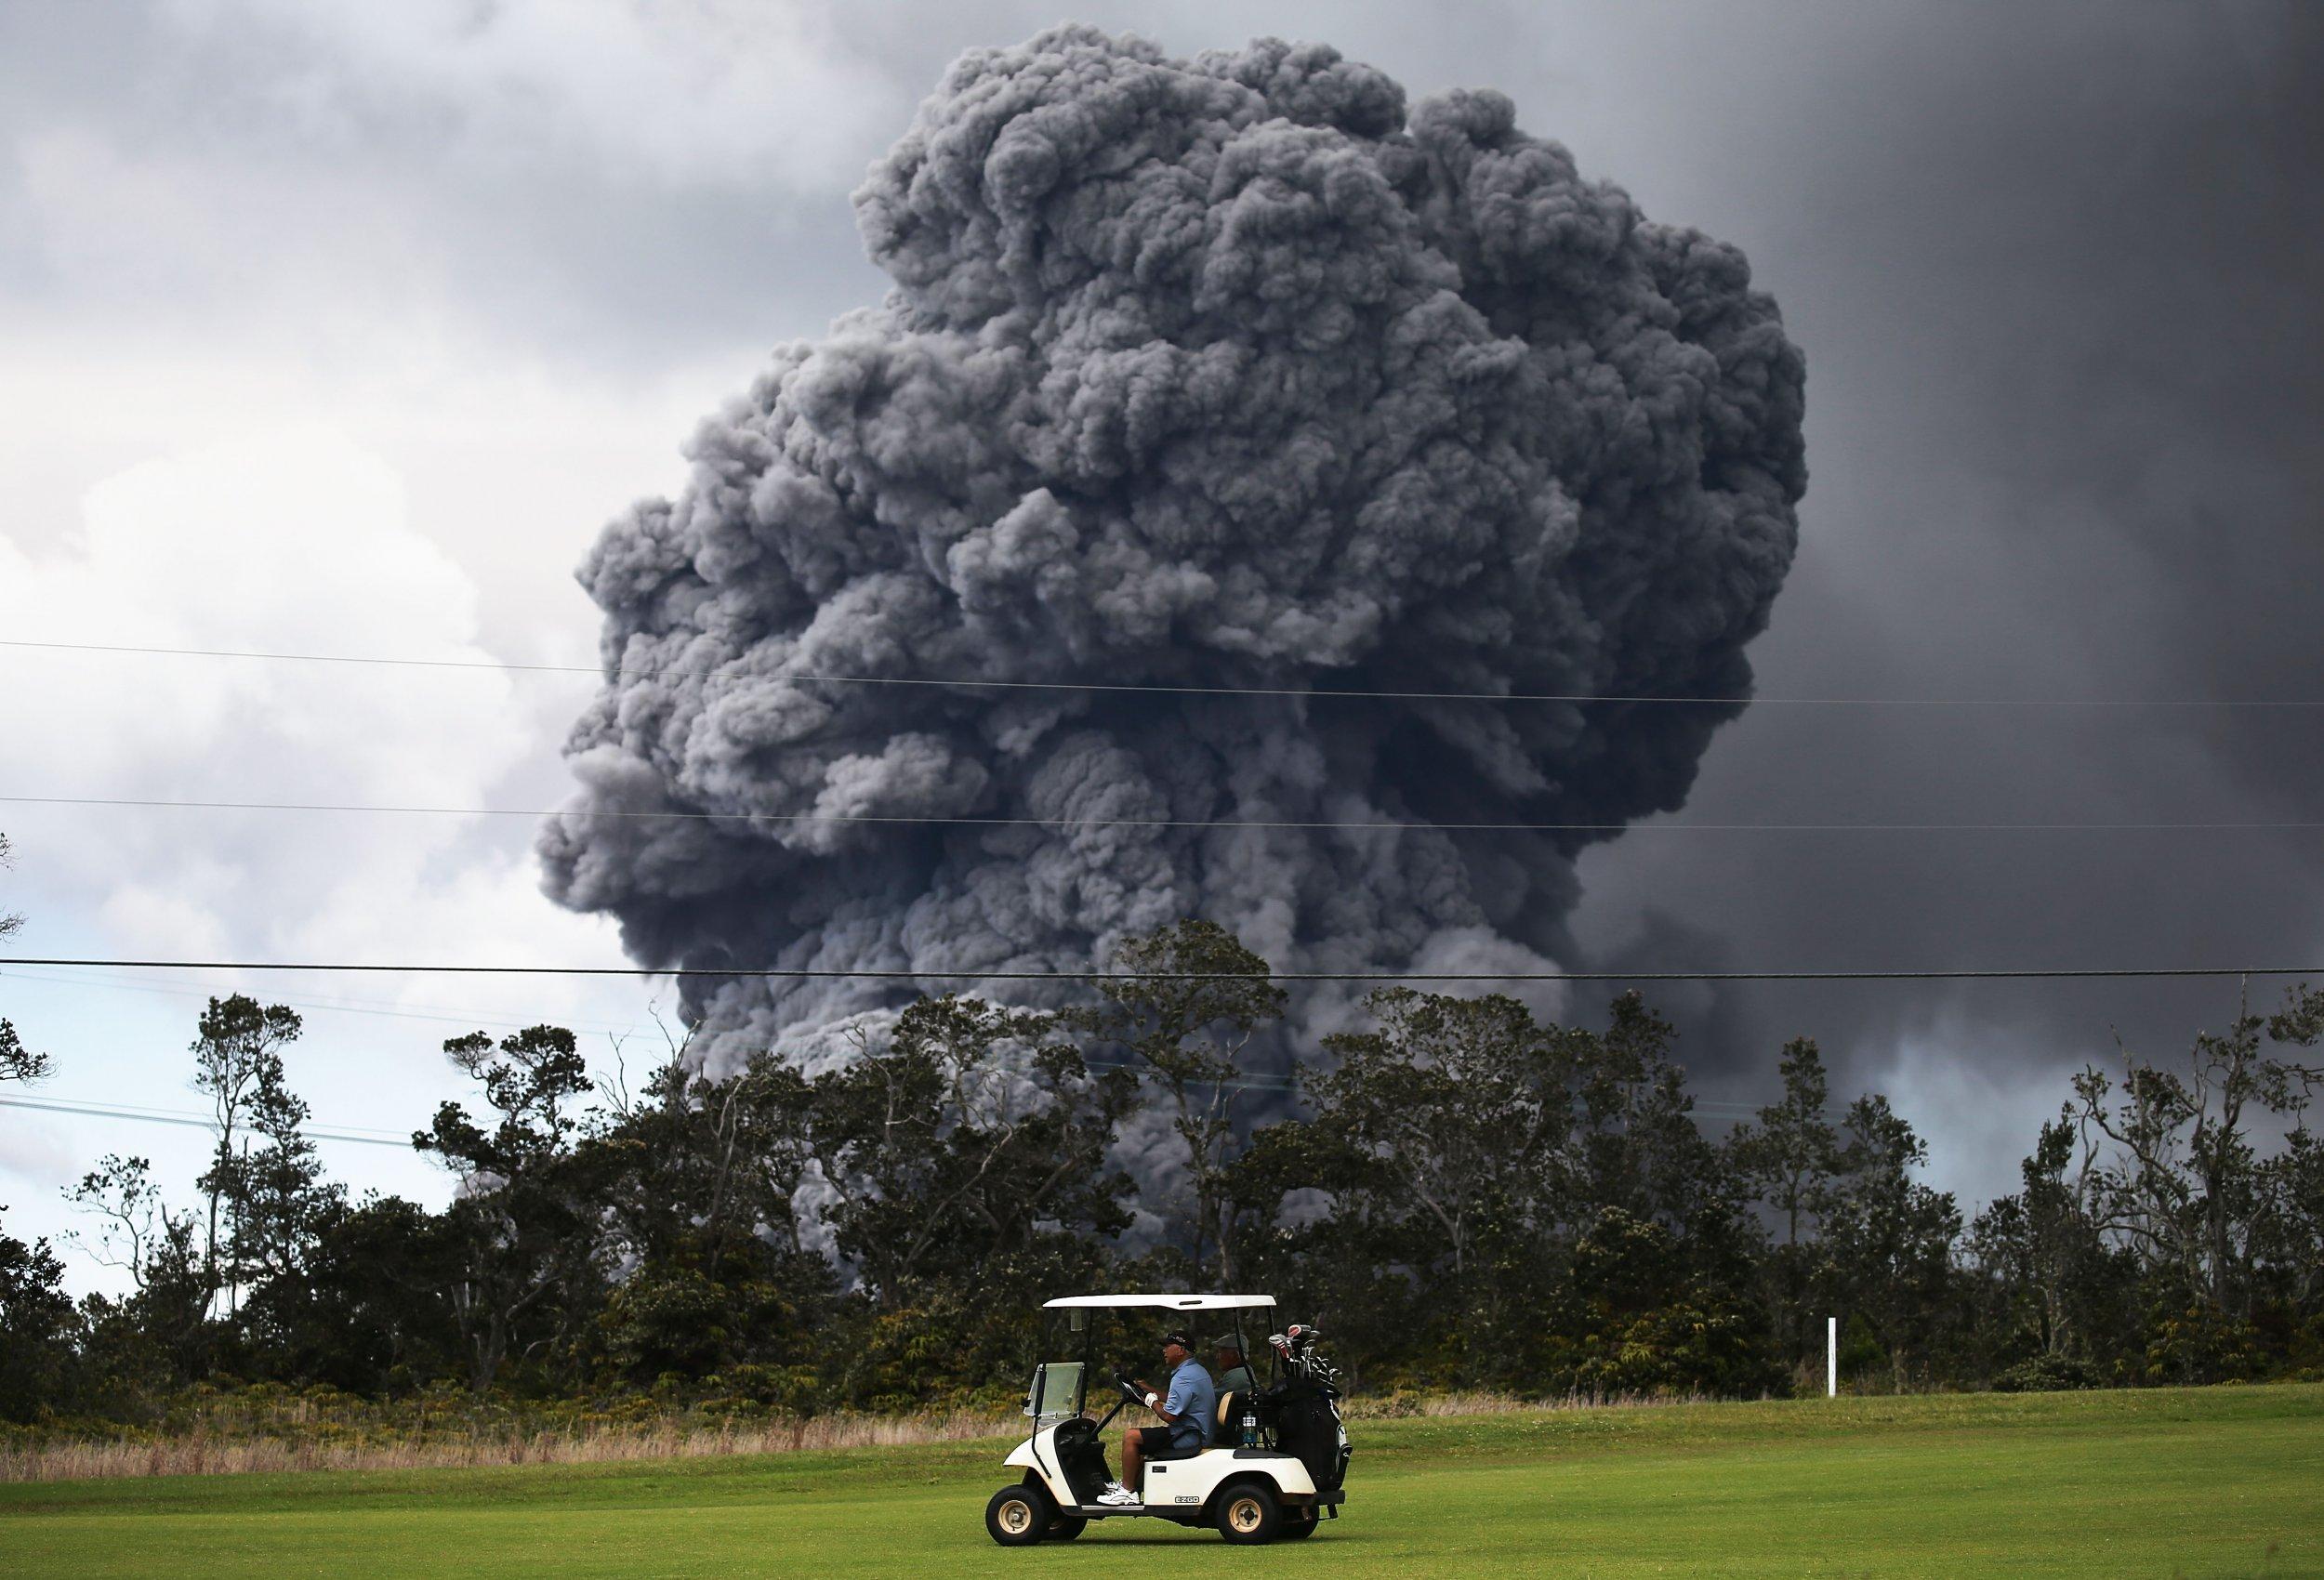 Hawaii Kilauea Volcano Red Alert Major Eruption Imminent As Ash Cloud Rises 12 000 Feet In